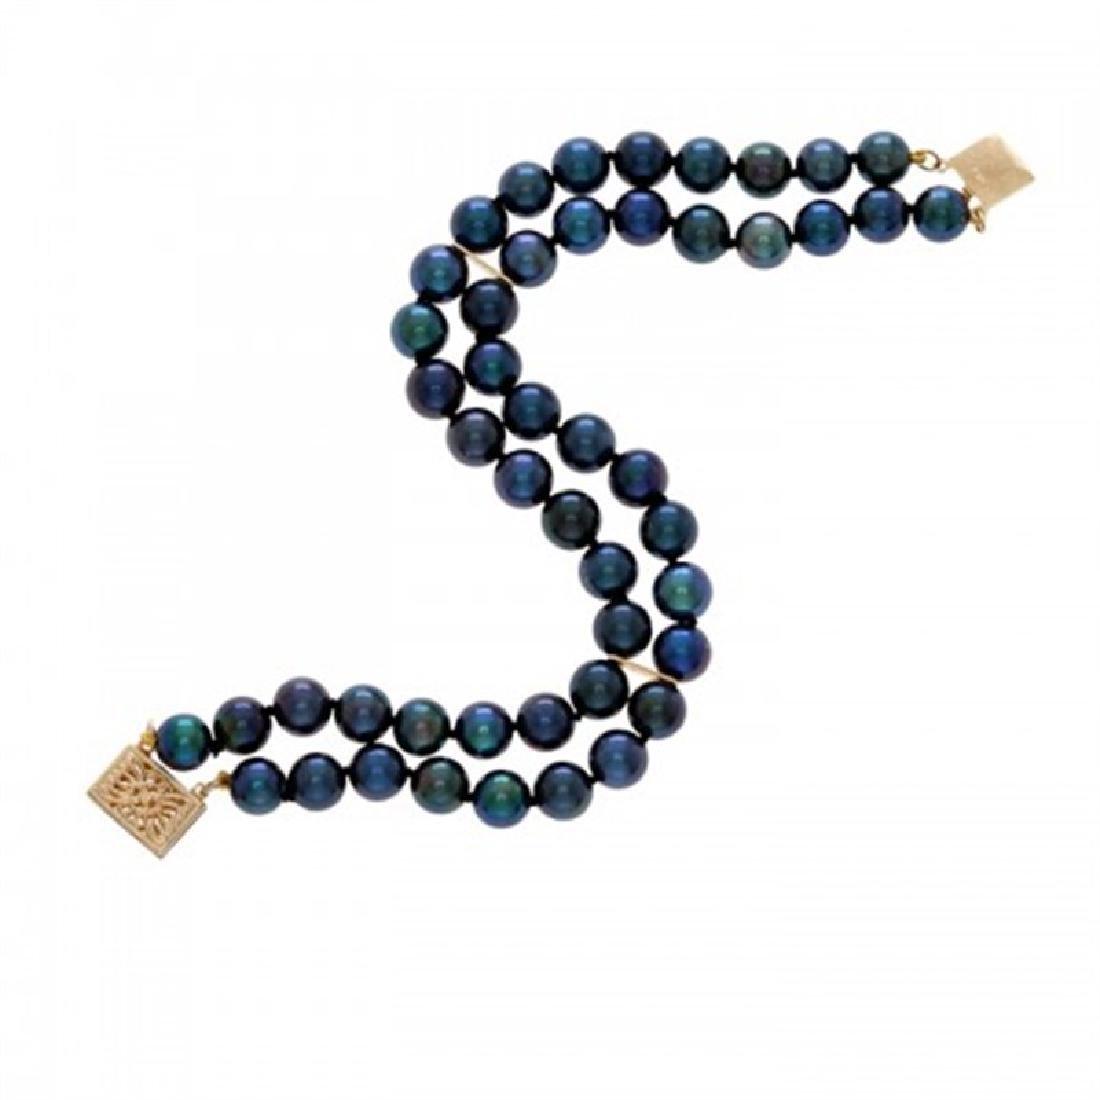 6.0-6.5mm Double Strand Japanese Akoya Black Pearl